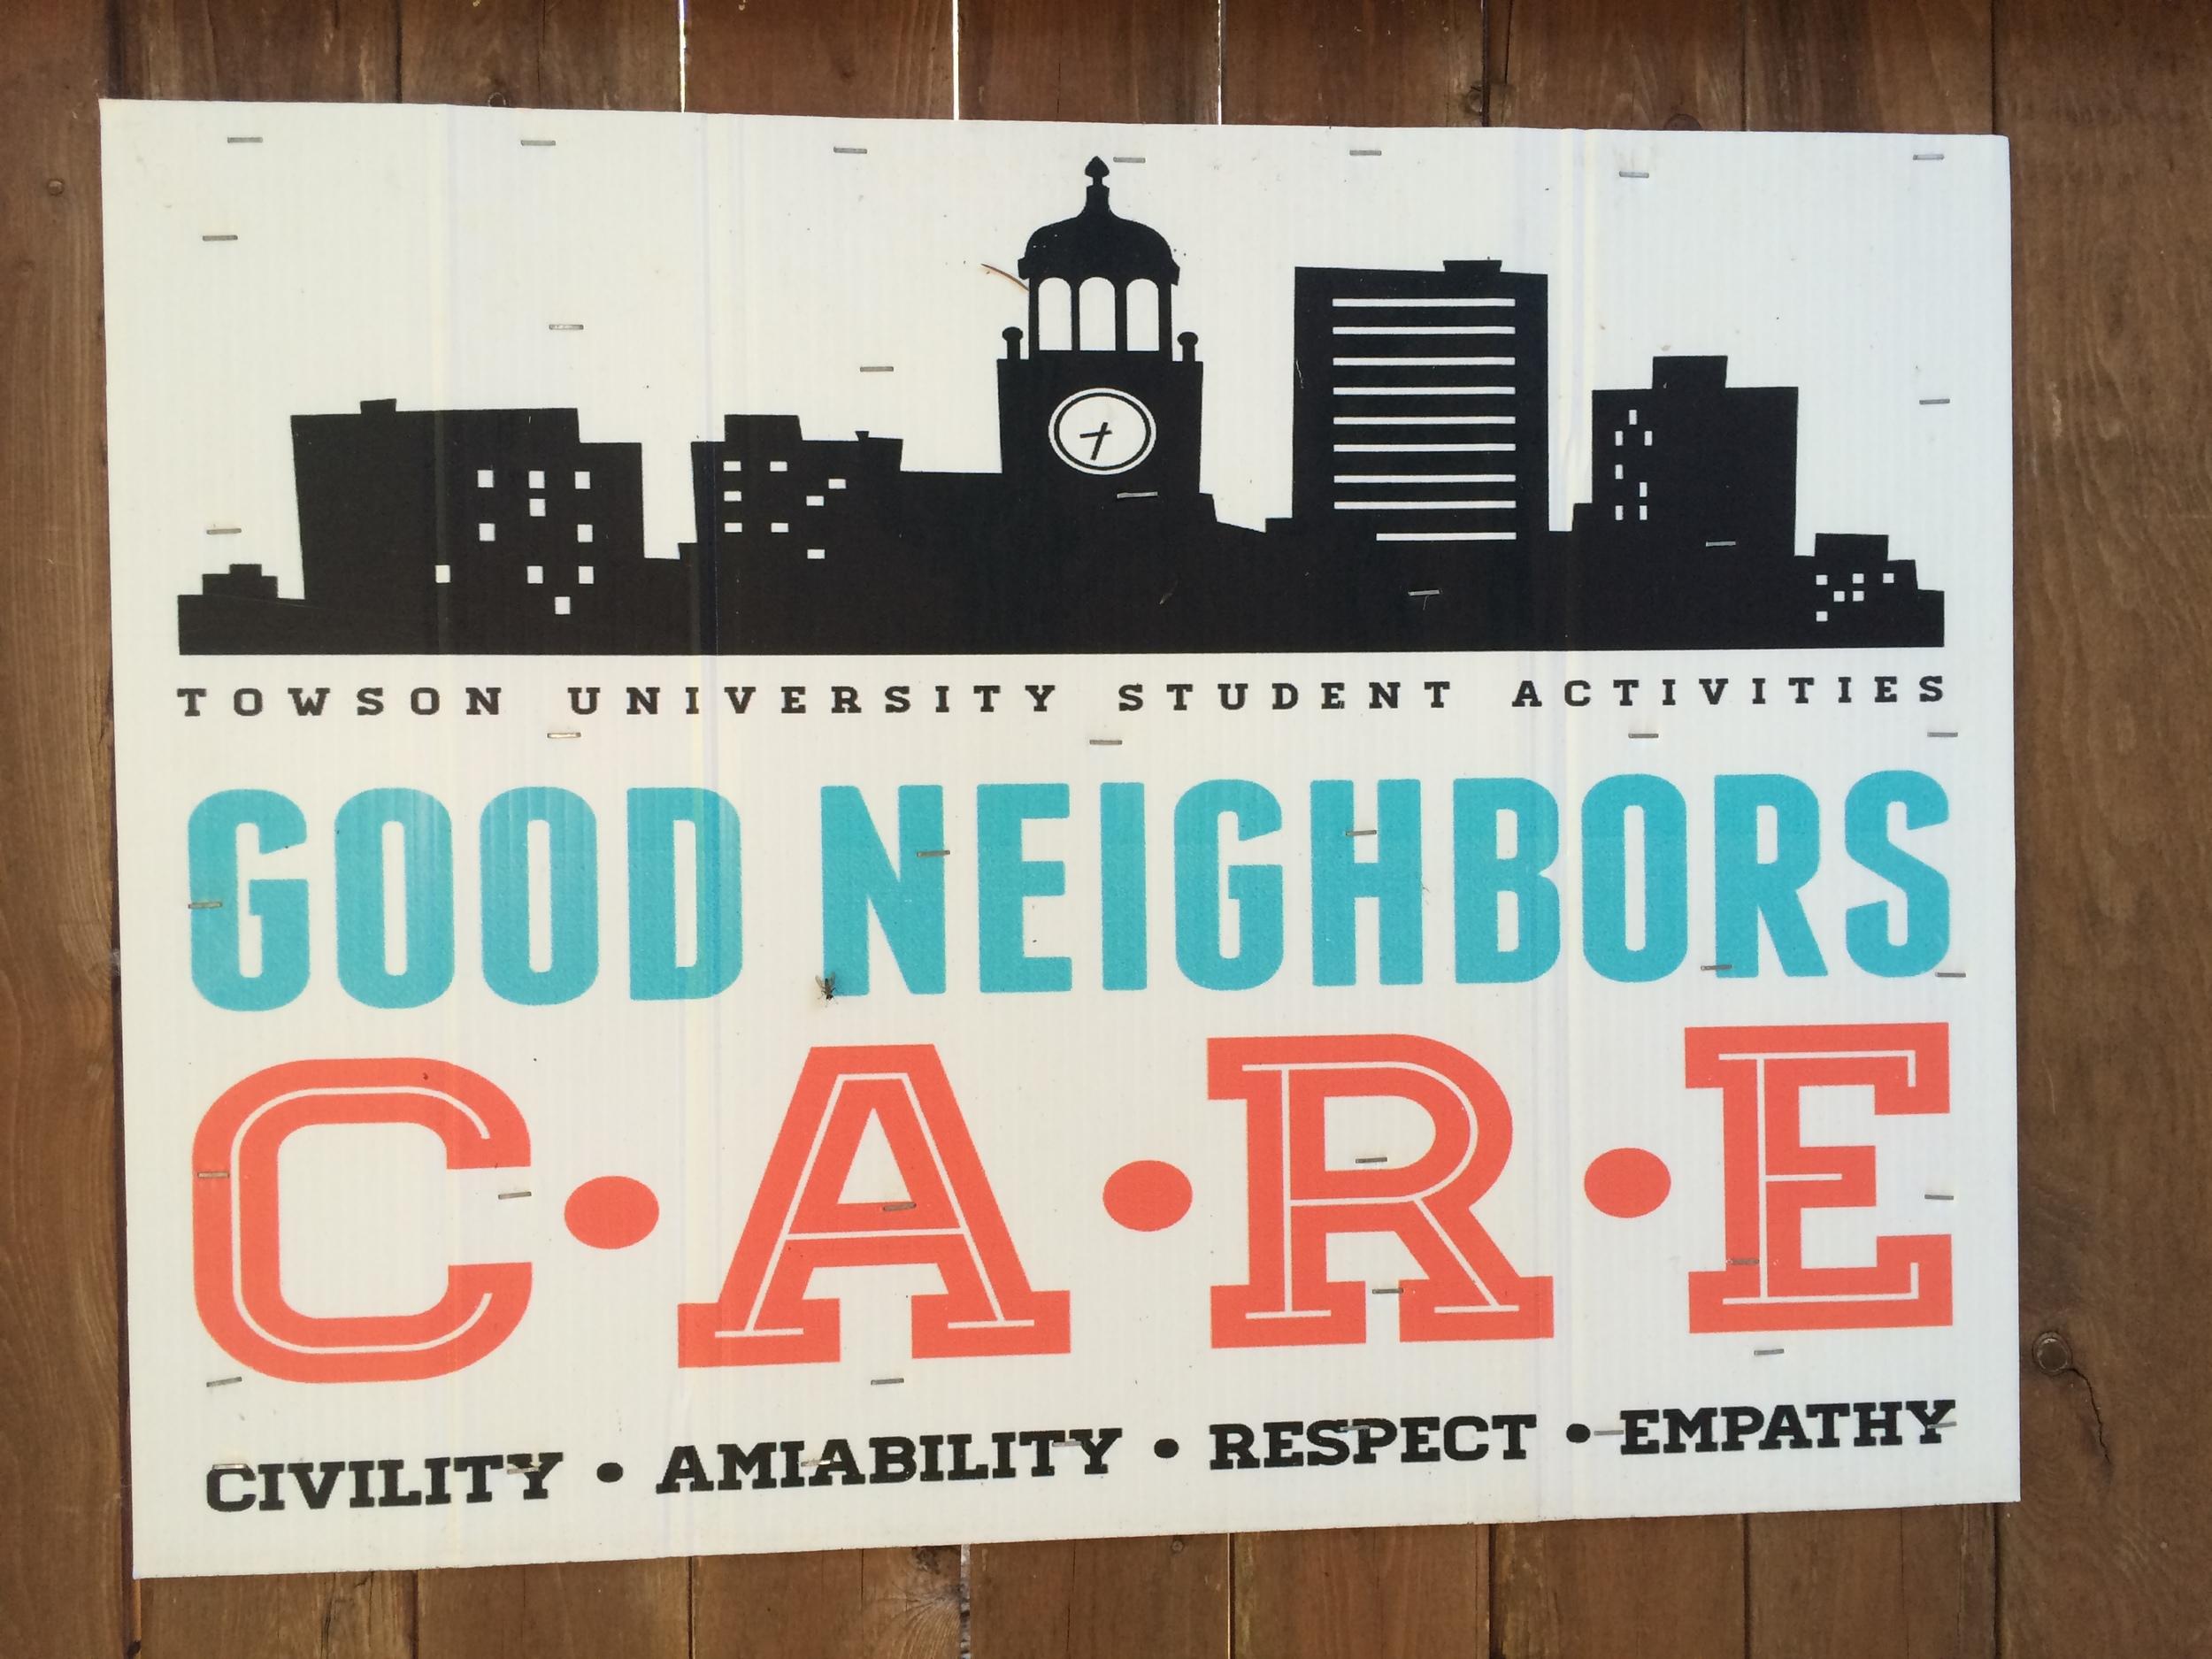 Good Neighborhood Partnership with Towson University